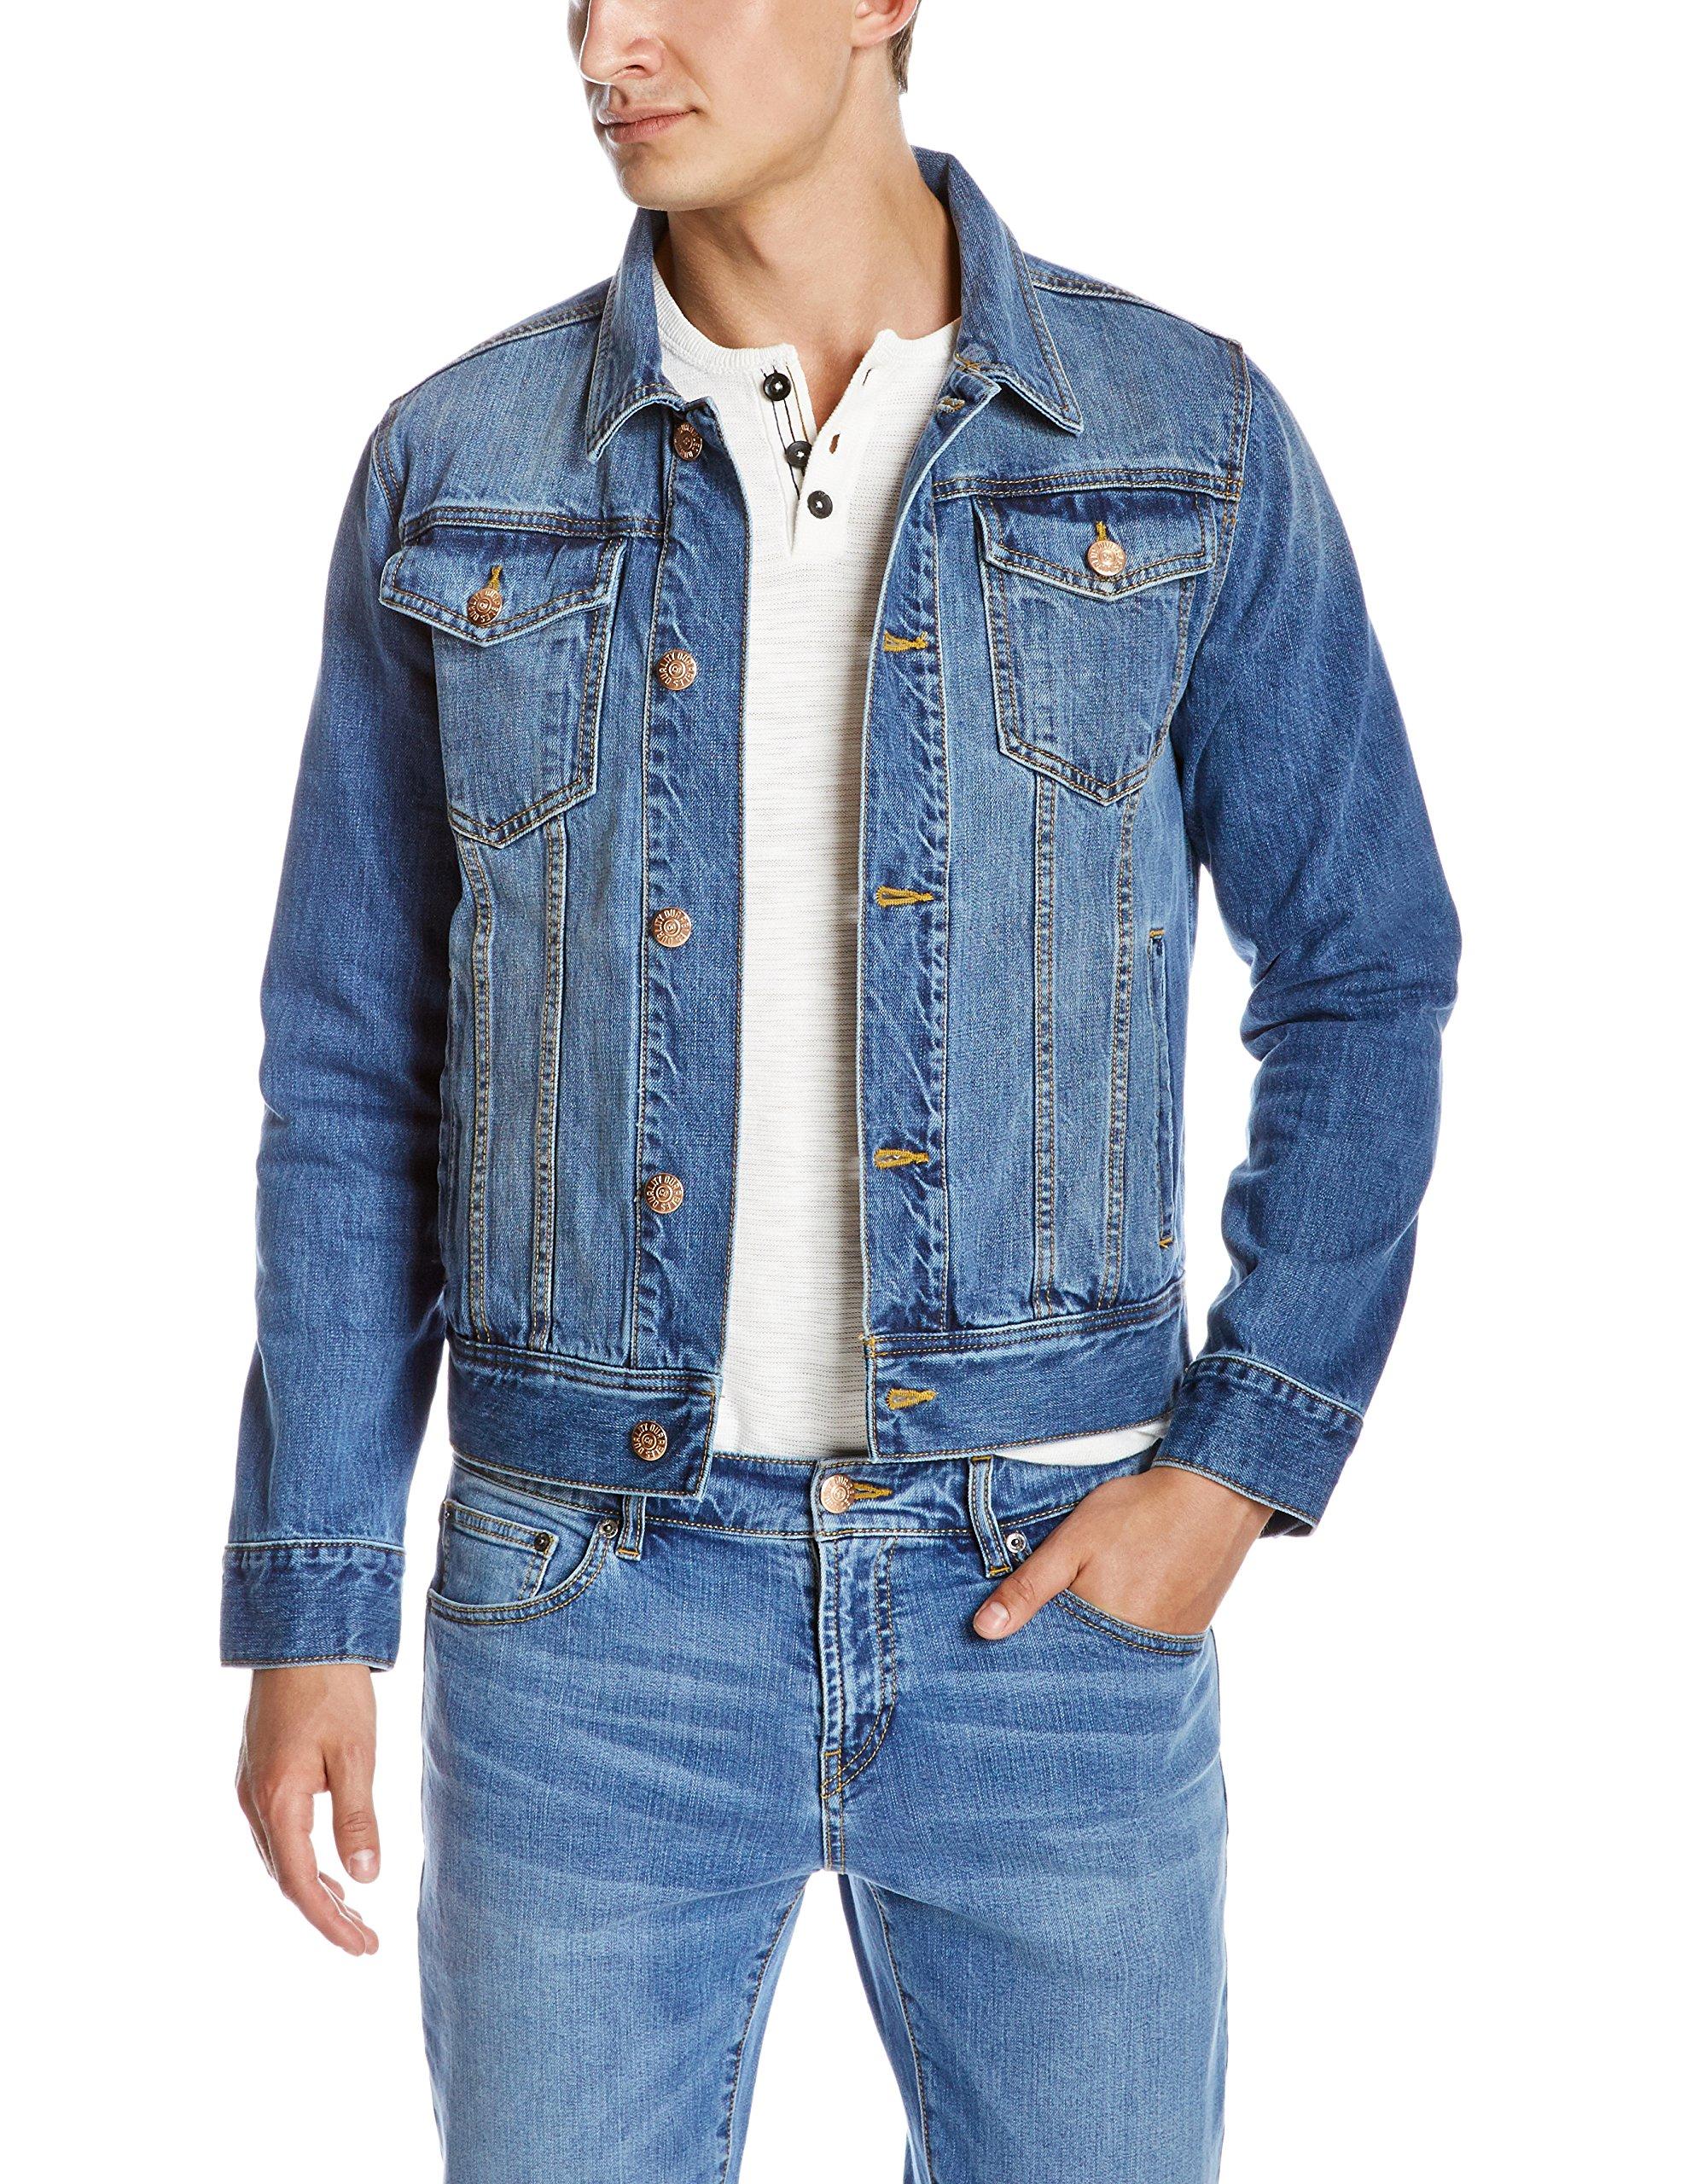 Quality Durables Co. Men's Regular-Fit Jean Jacket 2XL Paddle Wash